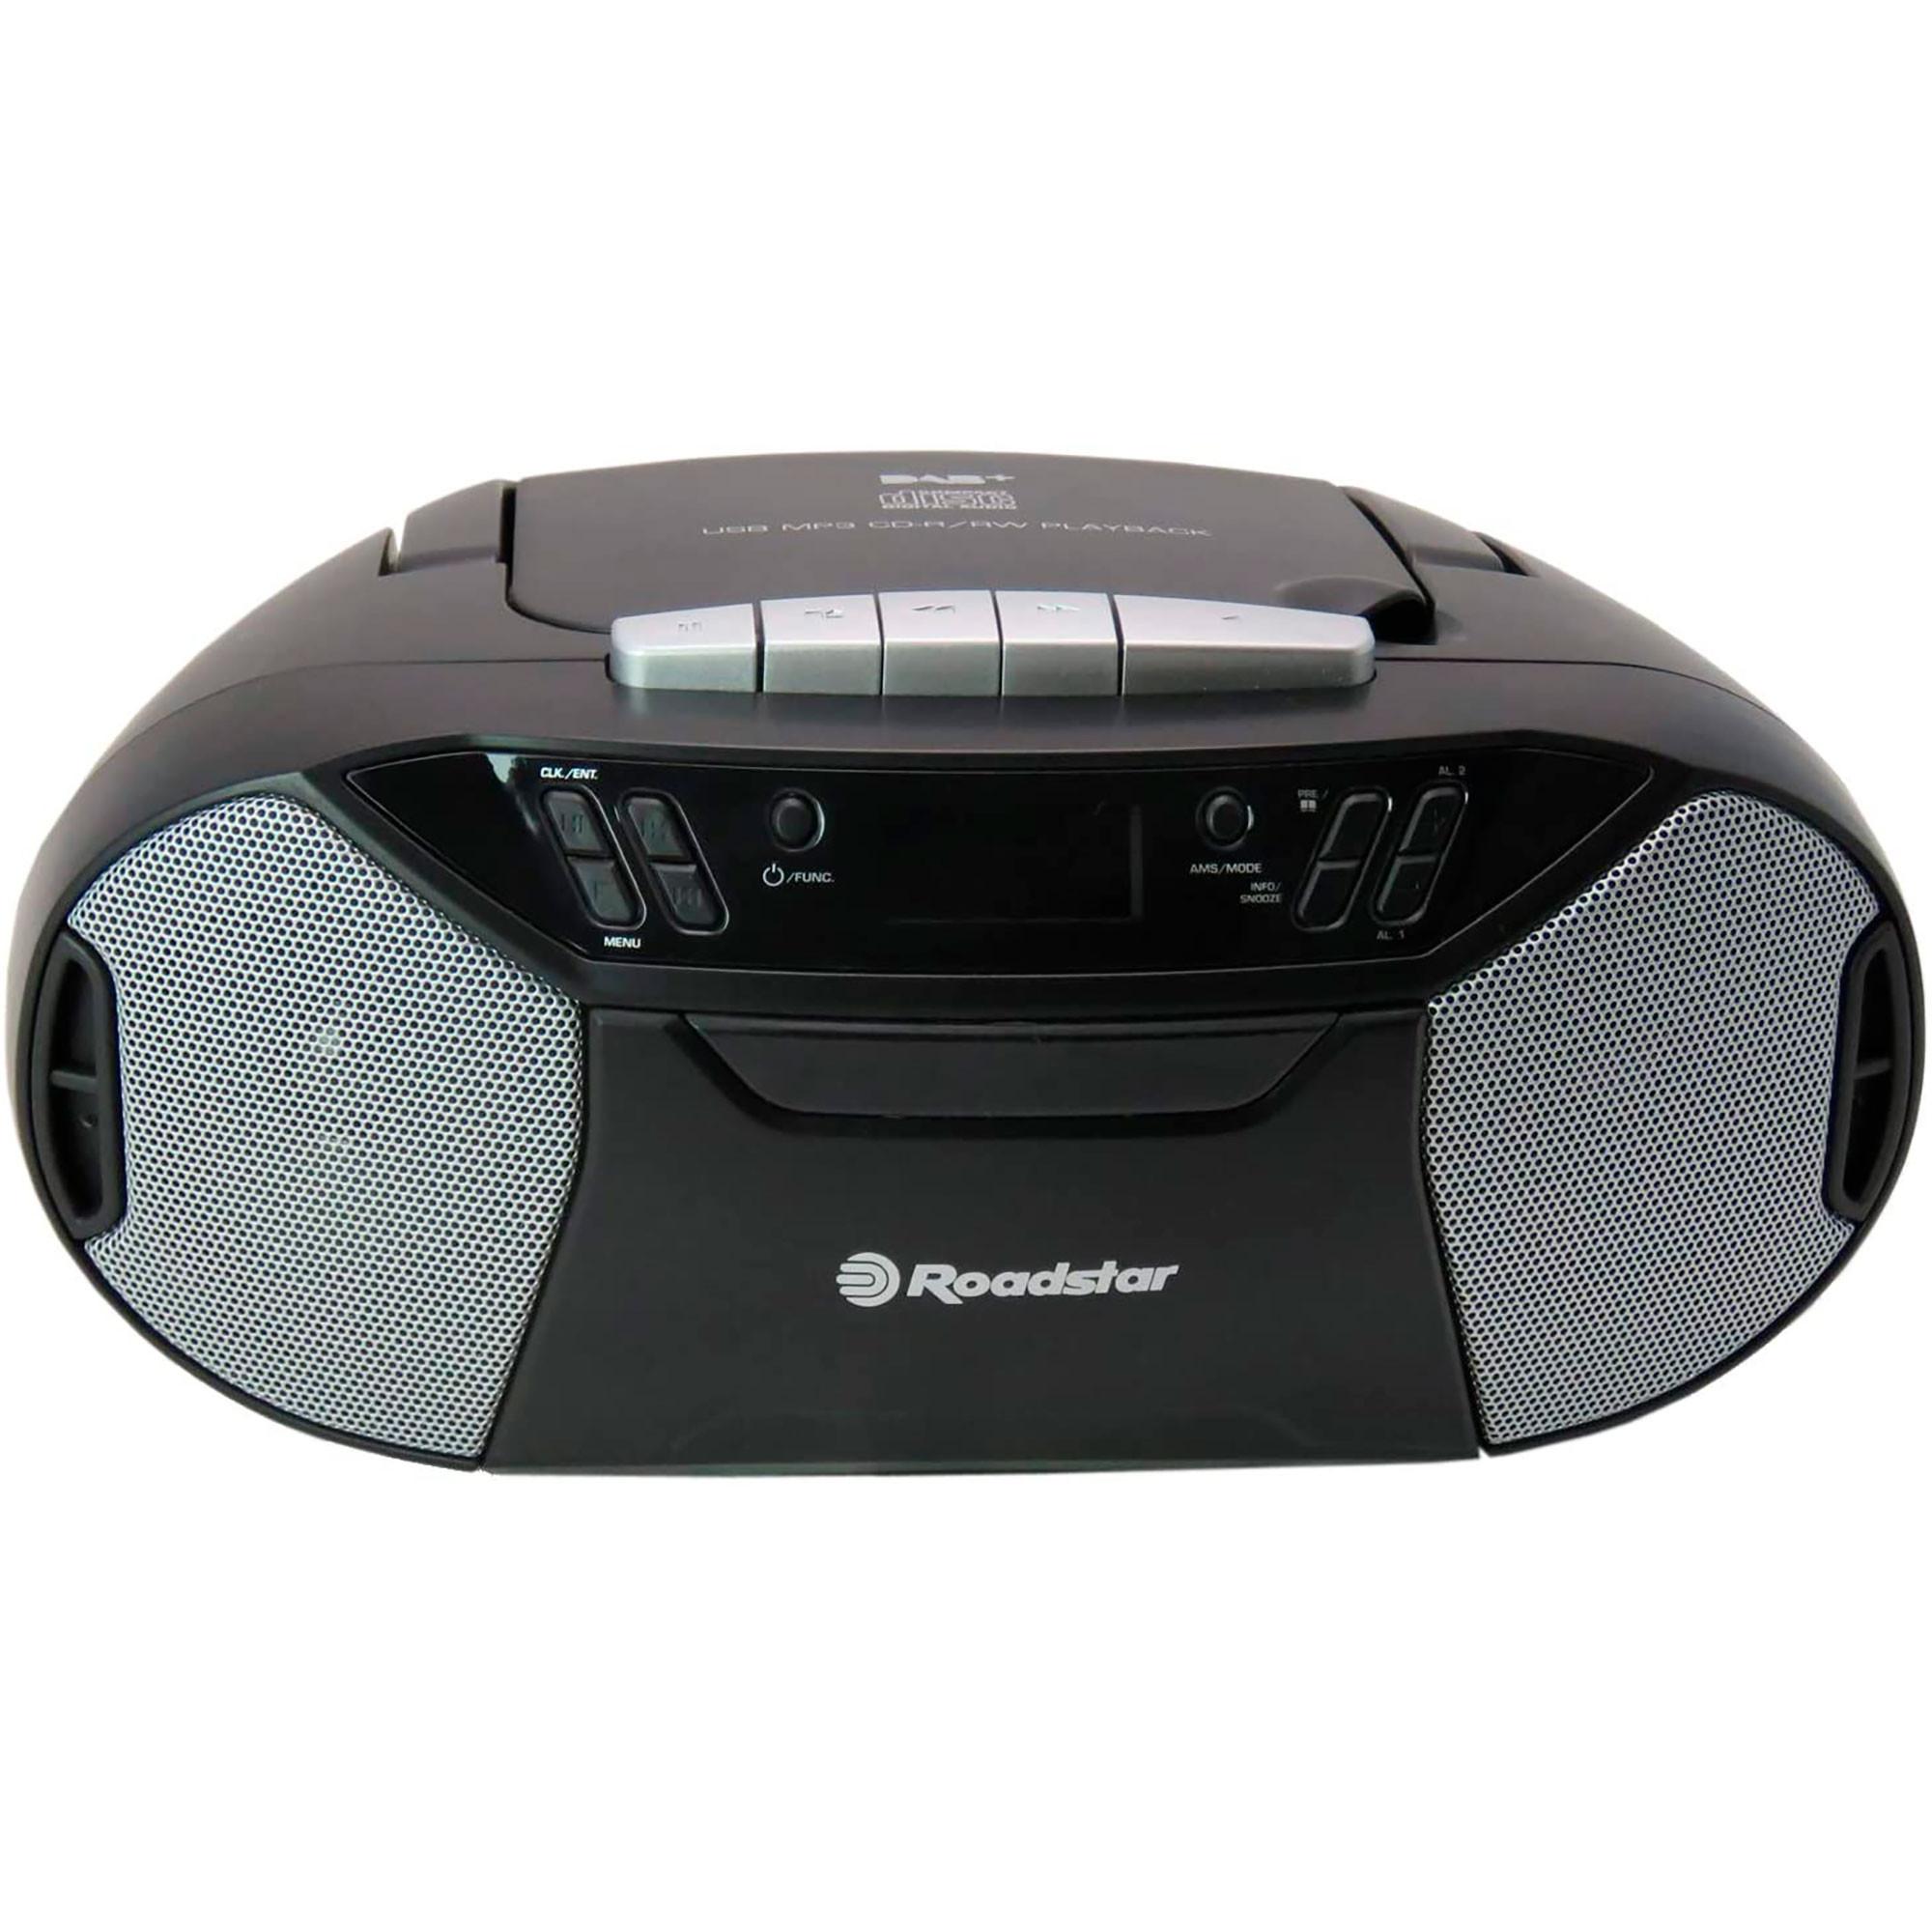 Roadstar RCR777UD Radio Portátil DAB/DAB +/FM, Reproductor CD-MP3, Cassette, USB, AUX-IN, Salida de Auriculares, Negro